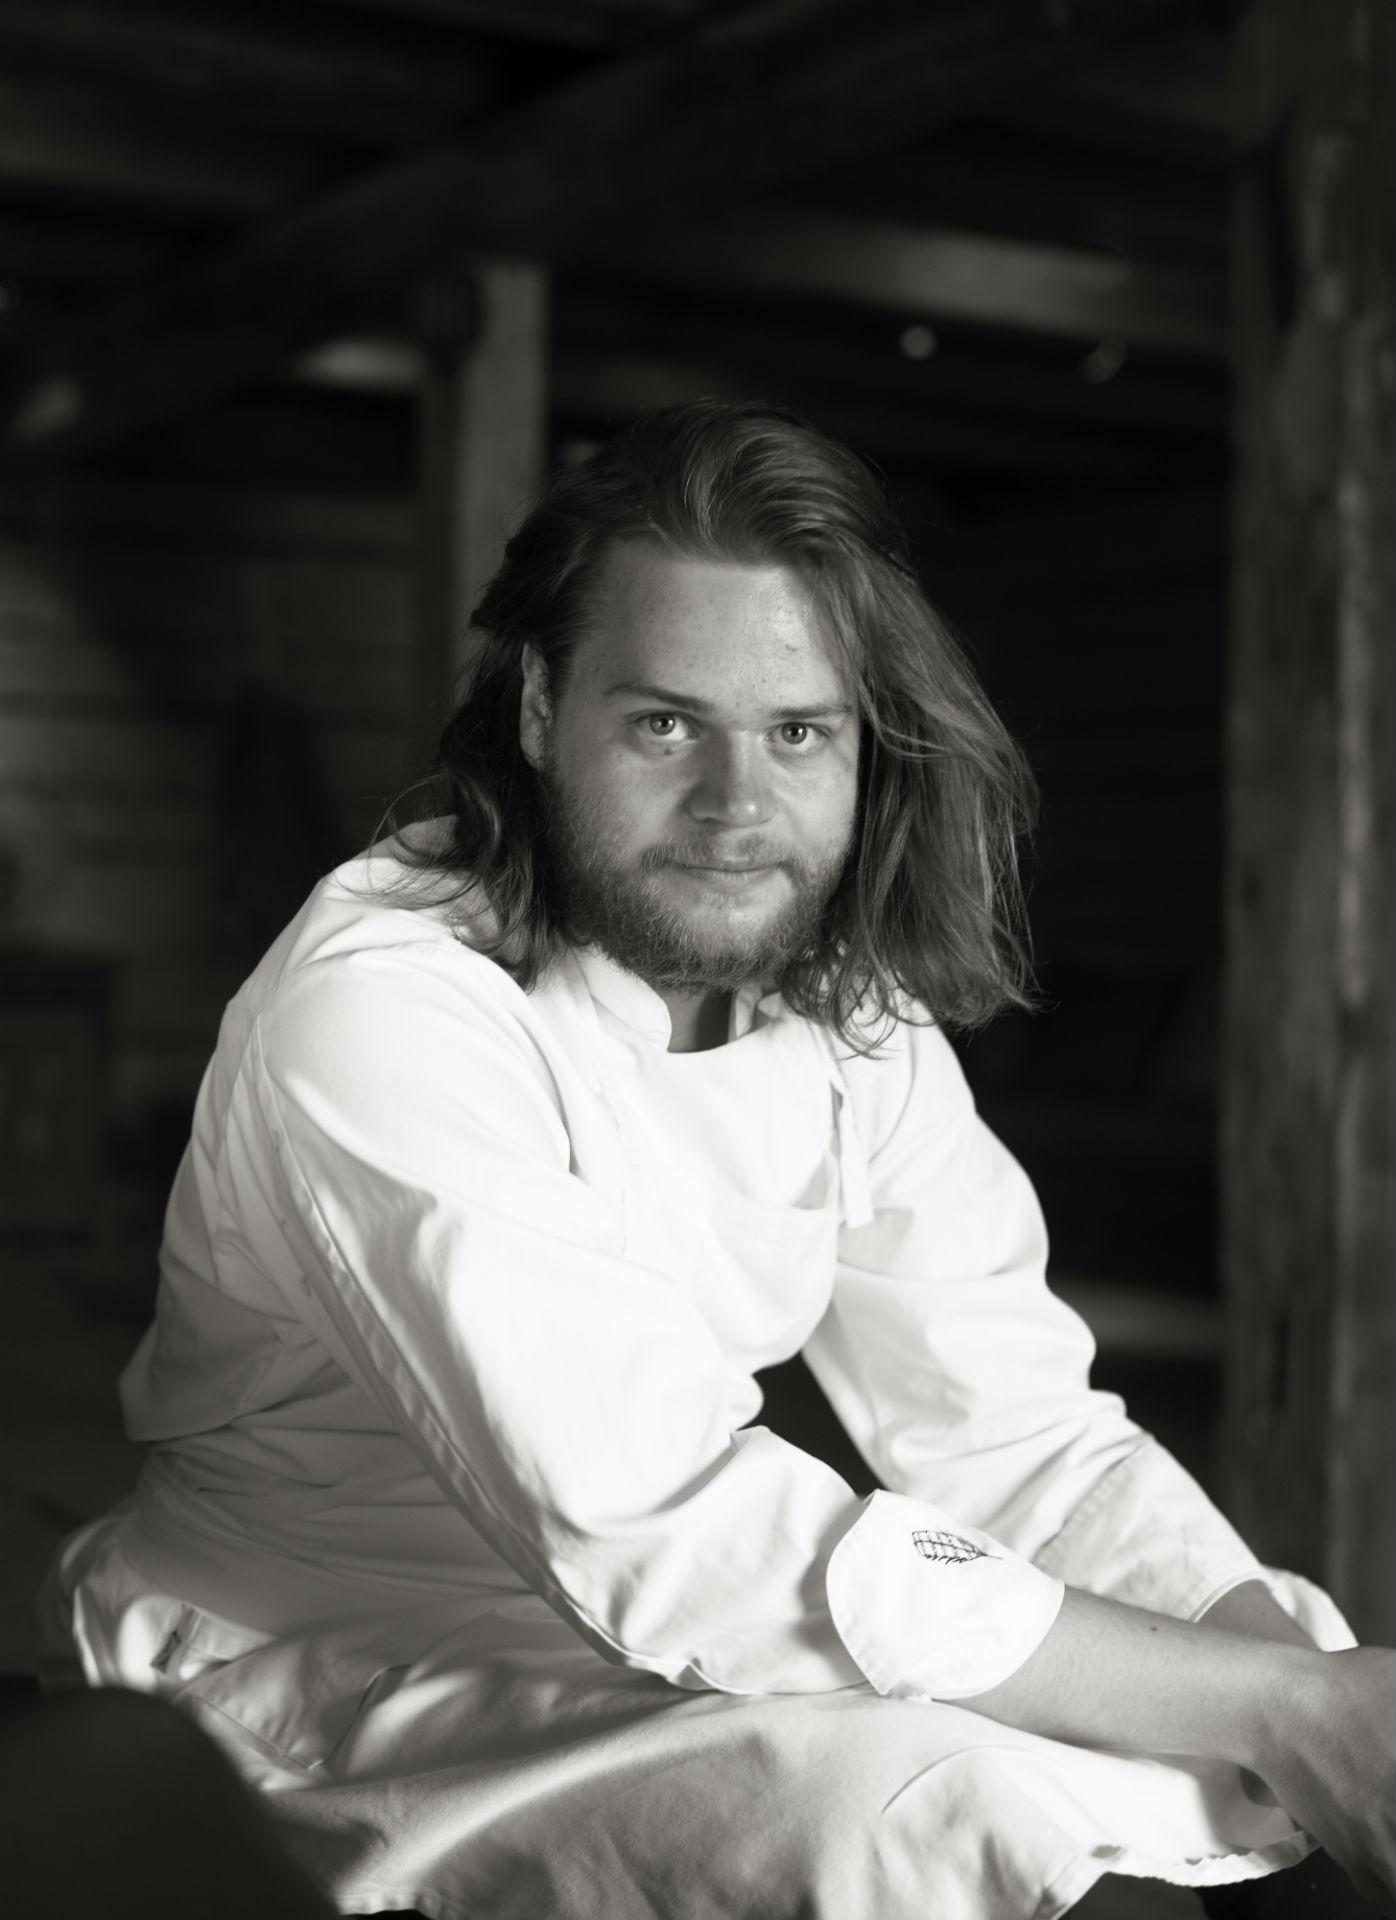 Magnus Nilsson, head chef Fäviken Magasinet, Järpen Sweden